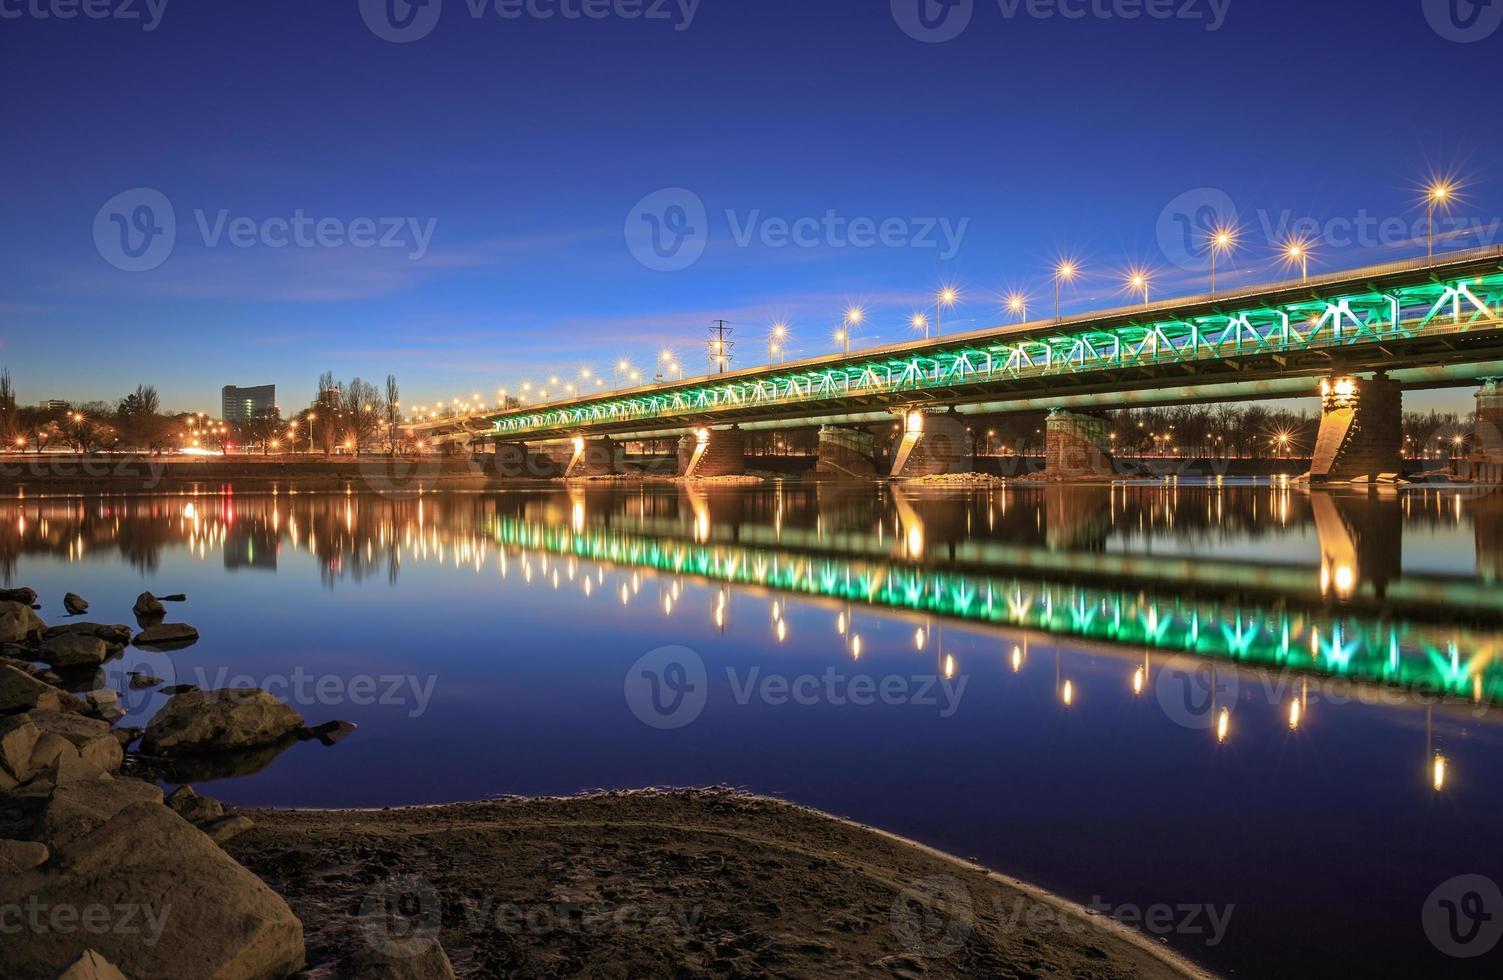 hervorgehobene Brücke in der Nacht foto